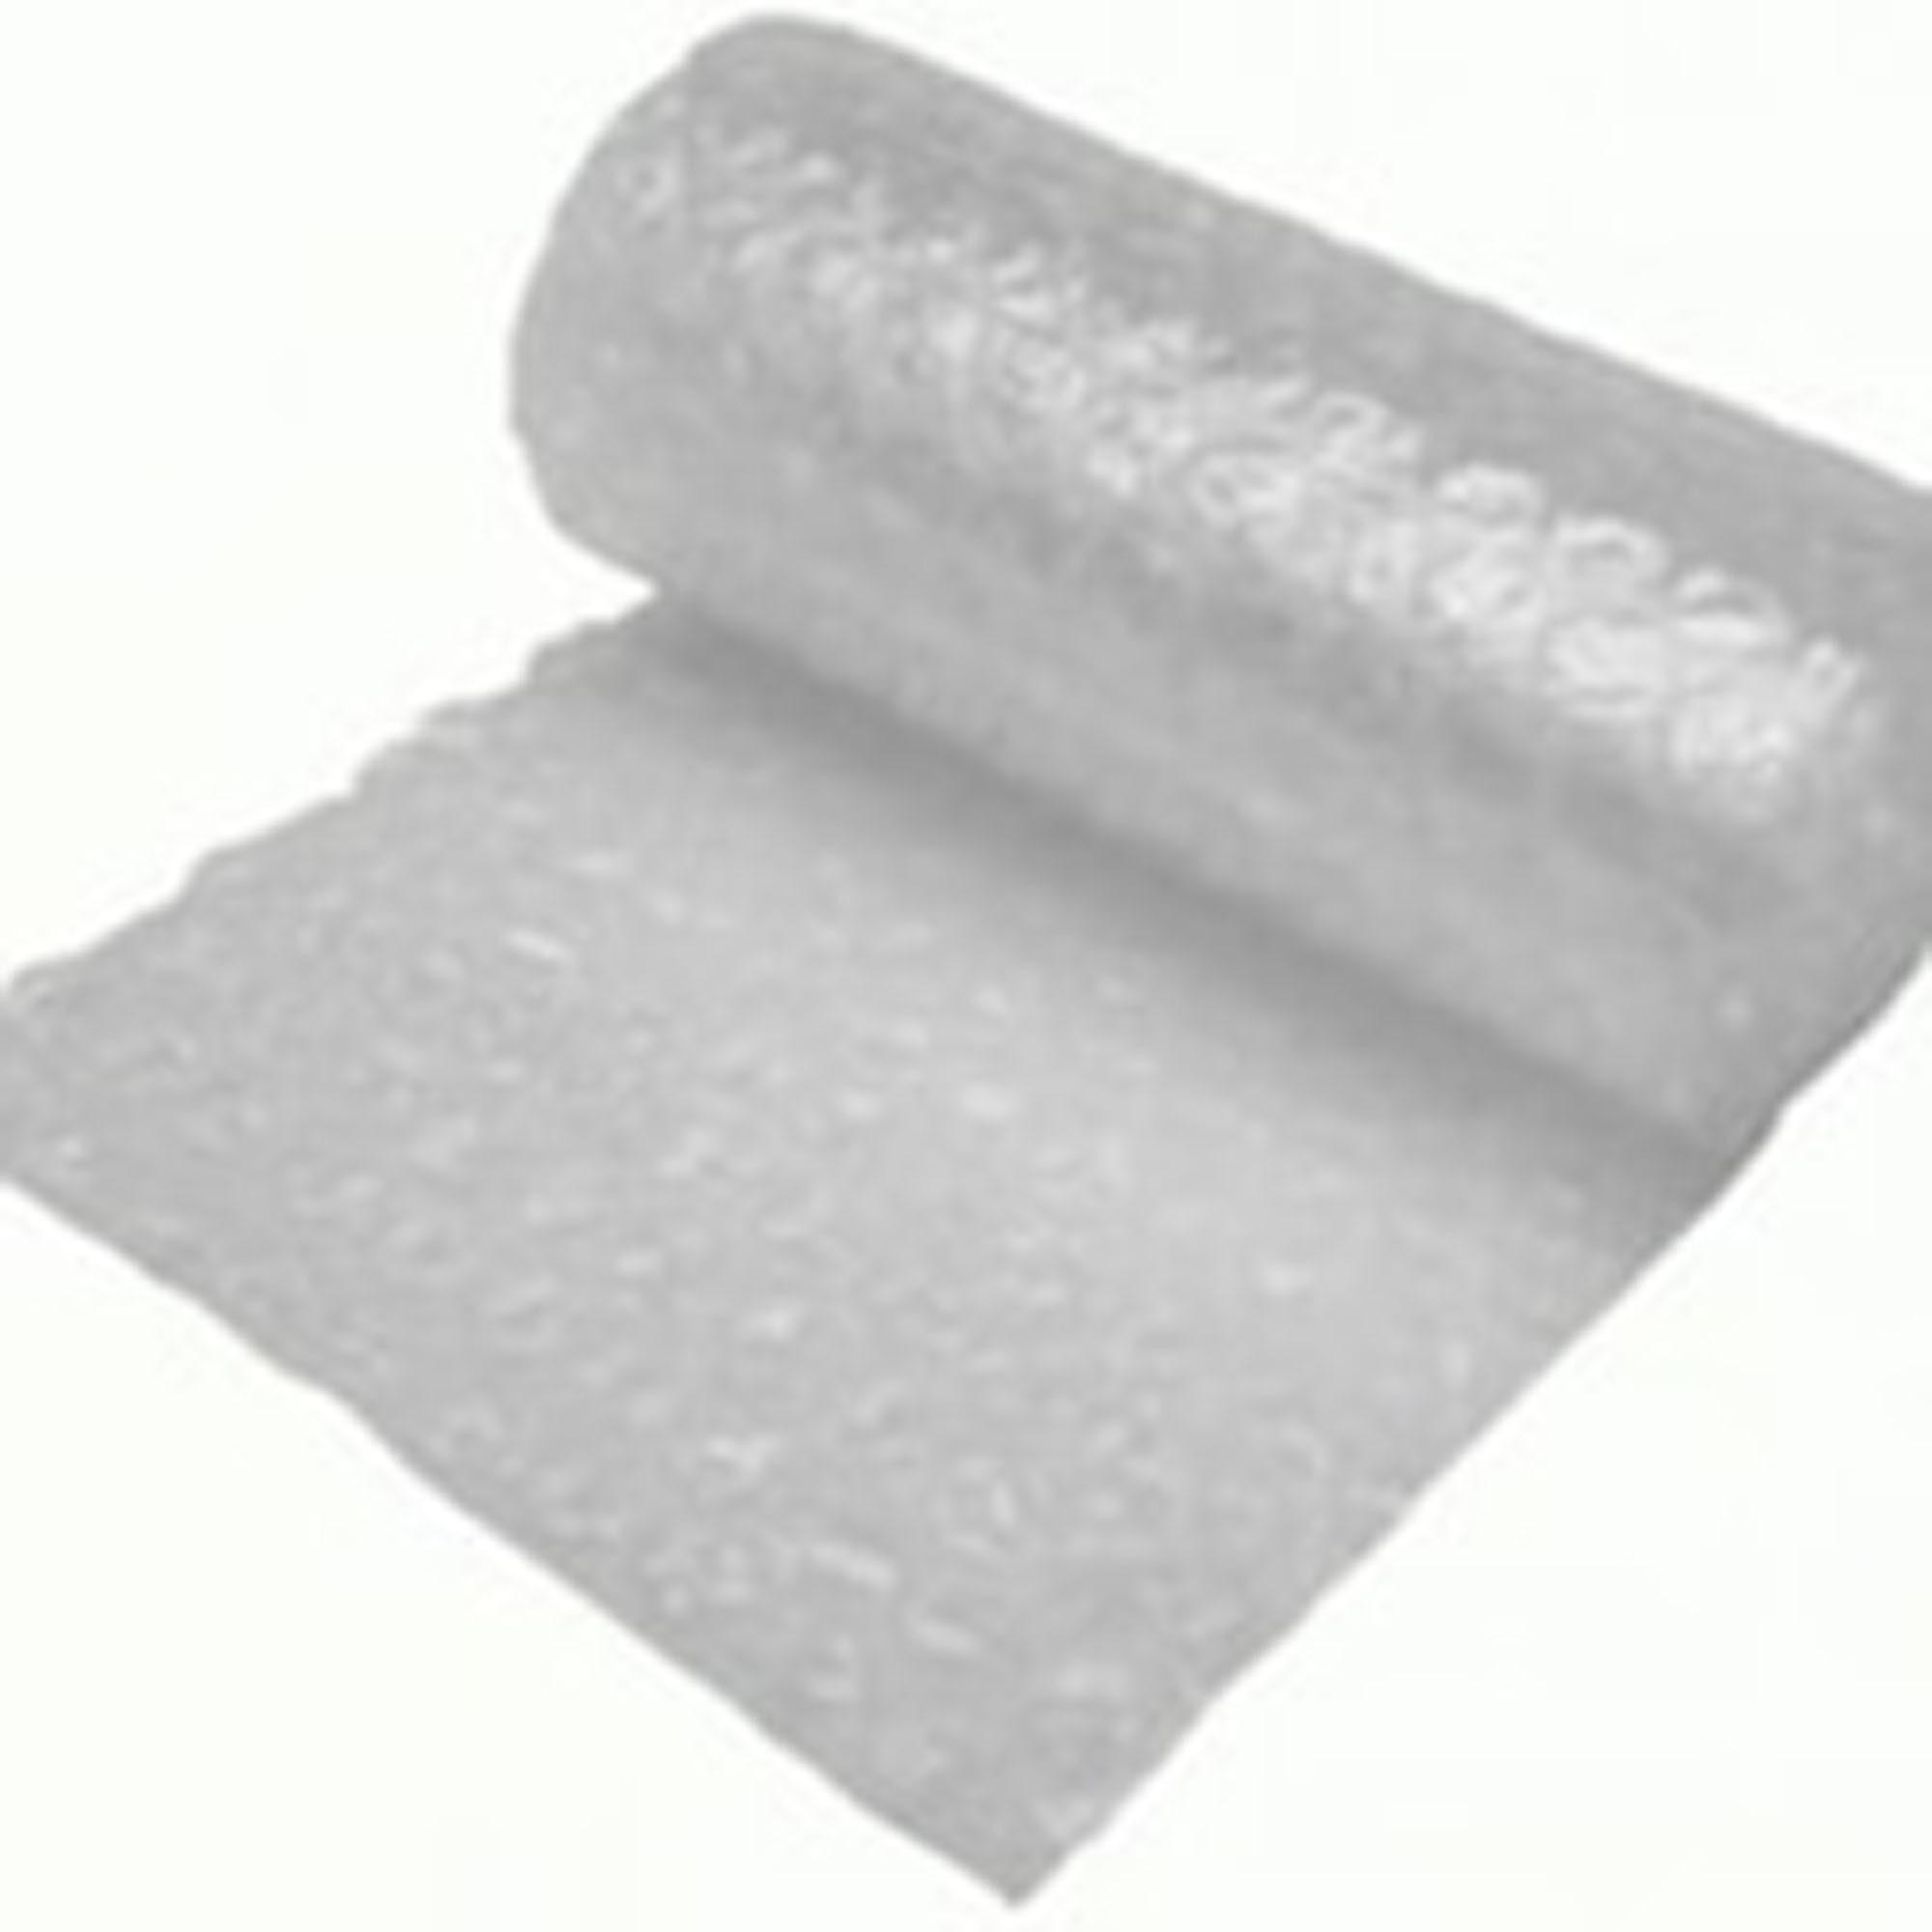 Bahan: Stainless Steel Isi 2pcs dalam 1 kemasan. Rp 3.800